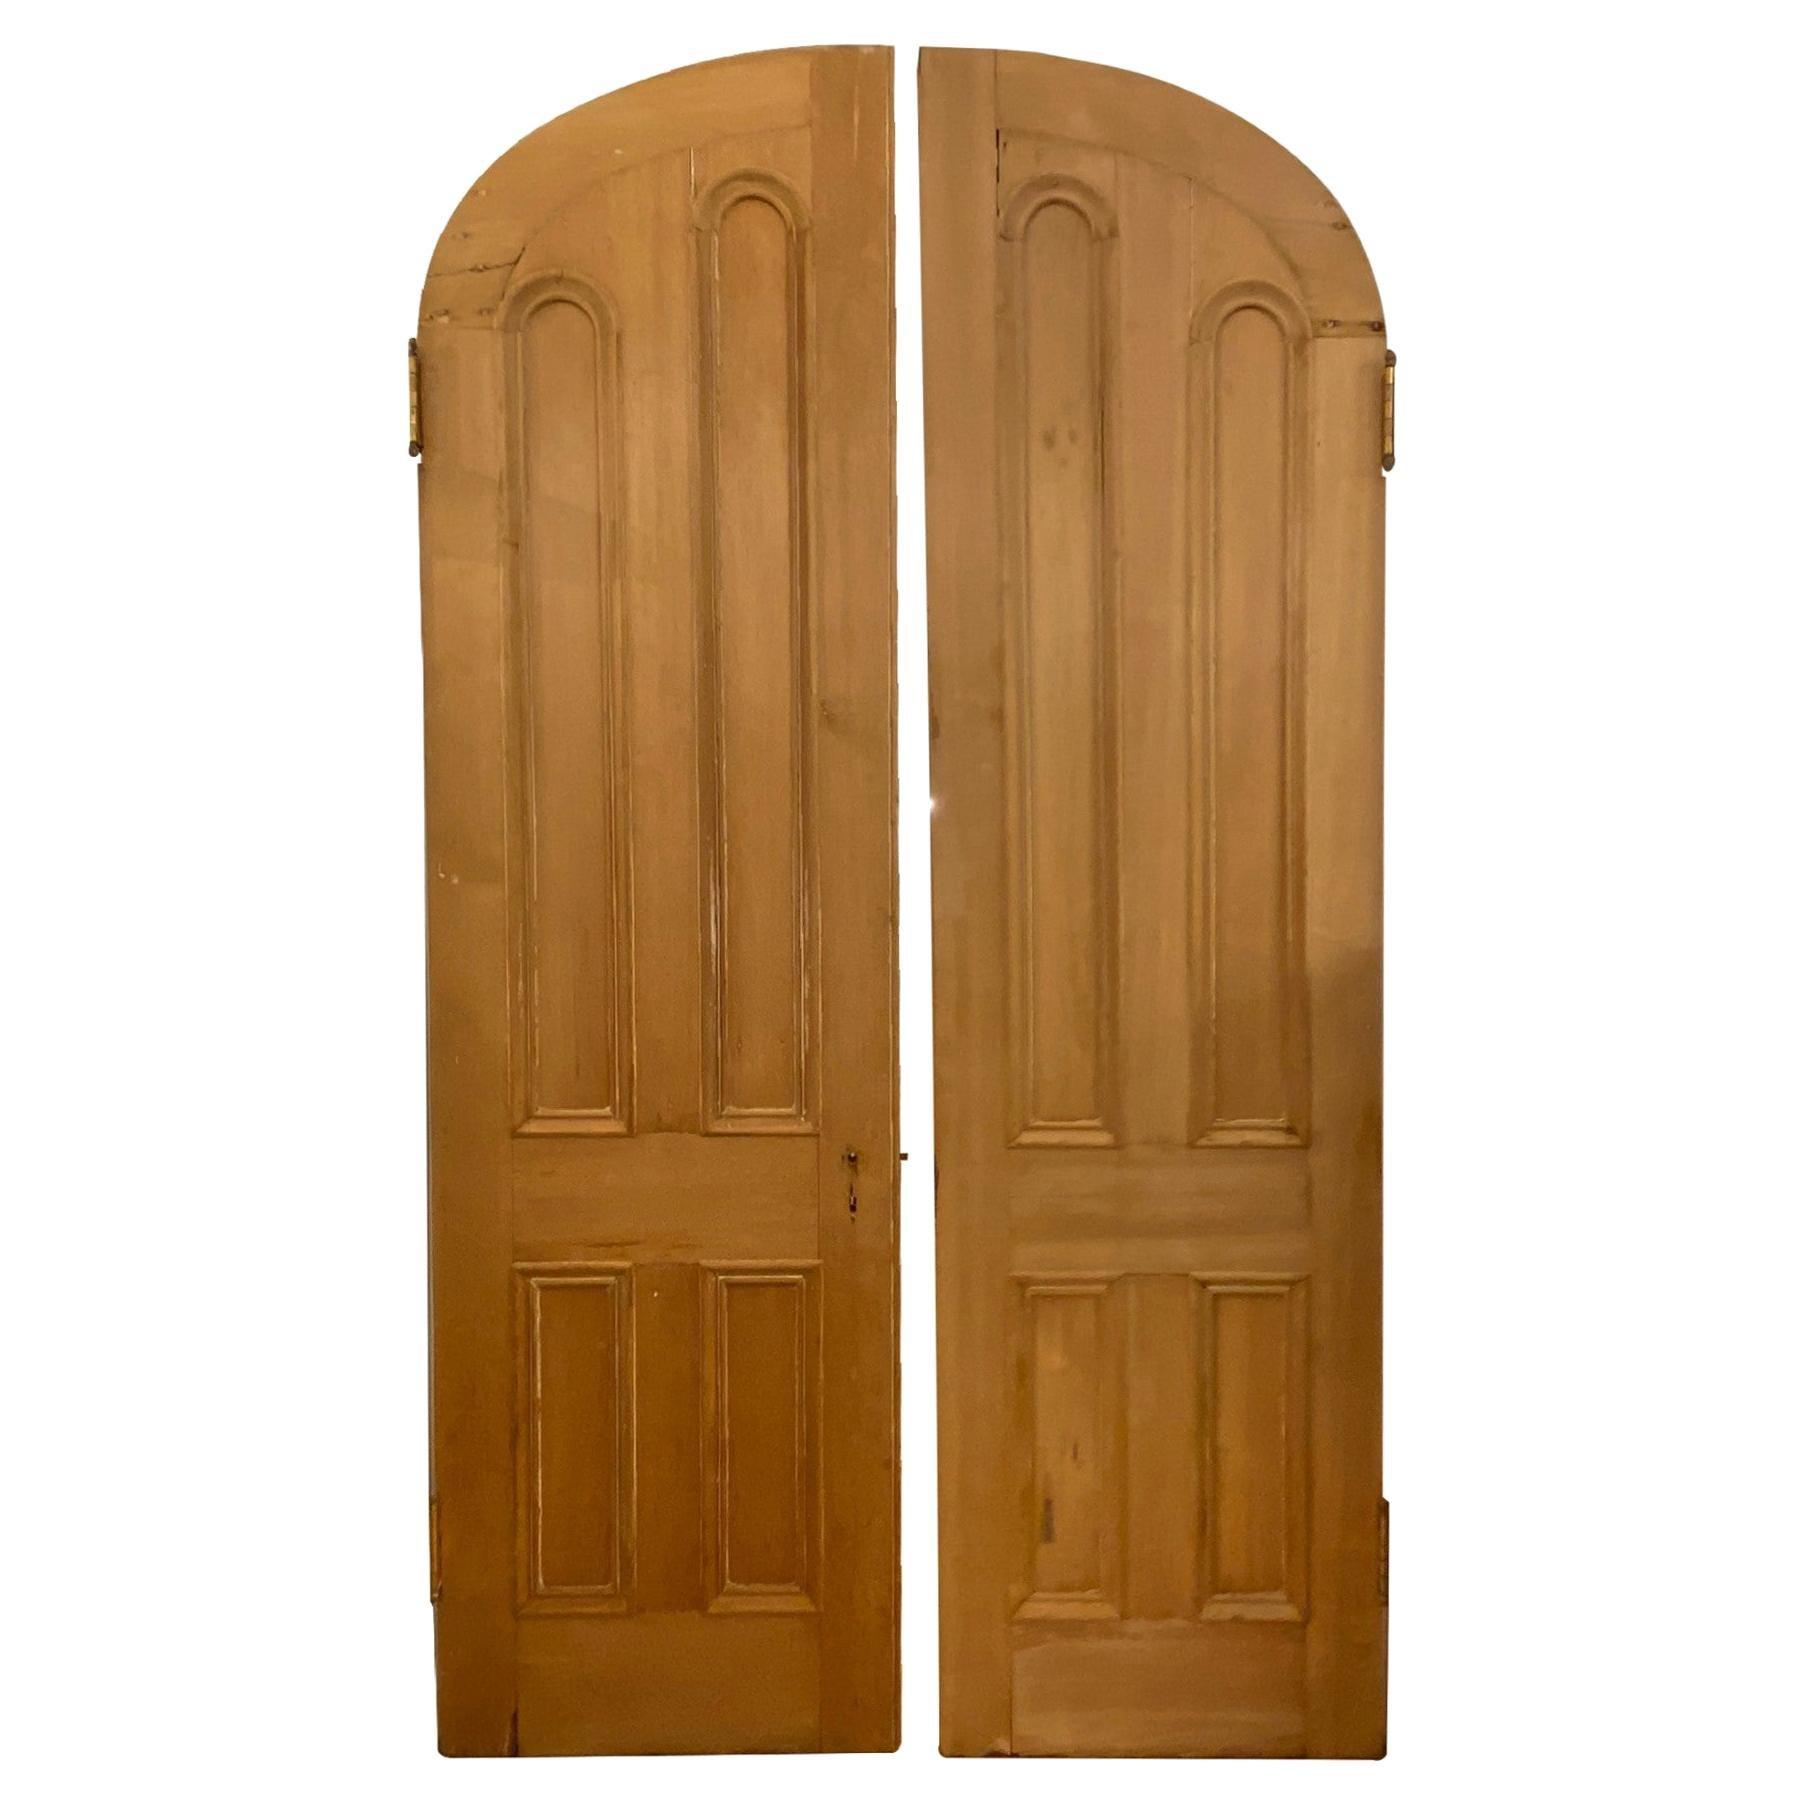 Antique Pair of 4 Pane Pine Arched Doors